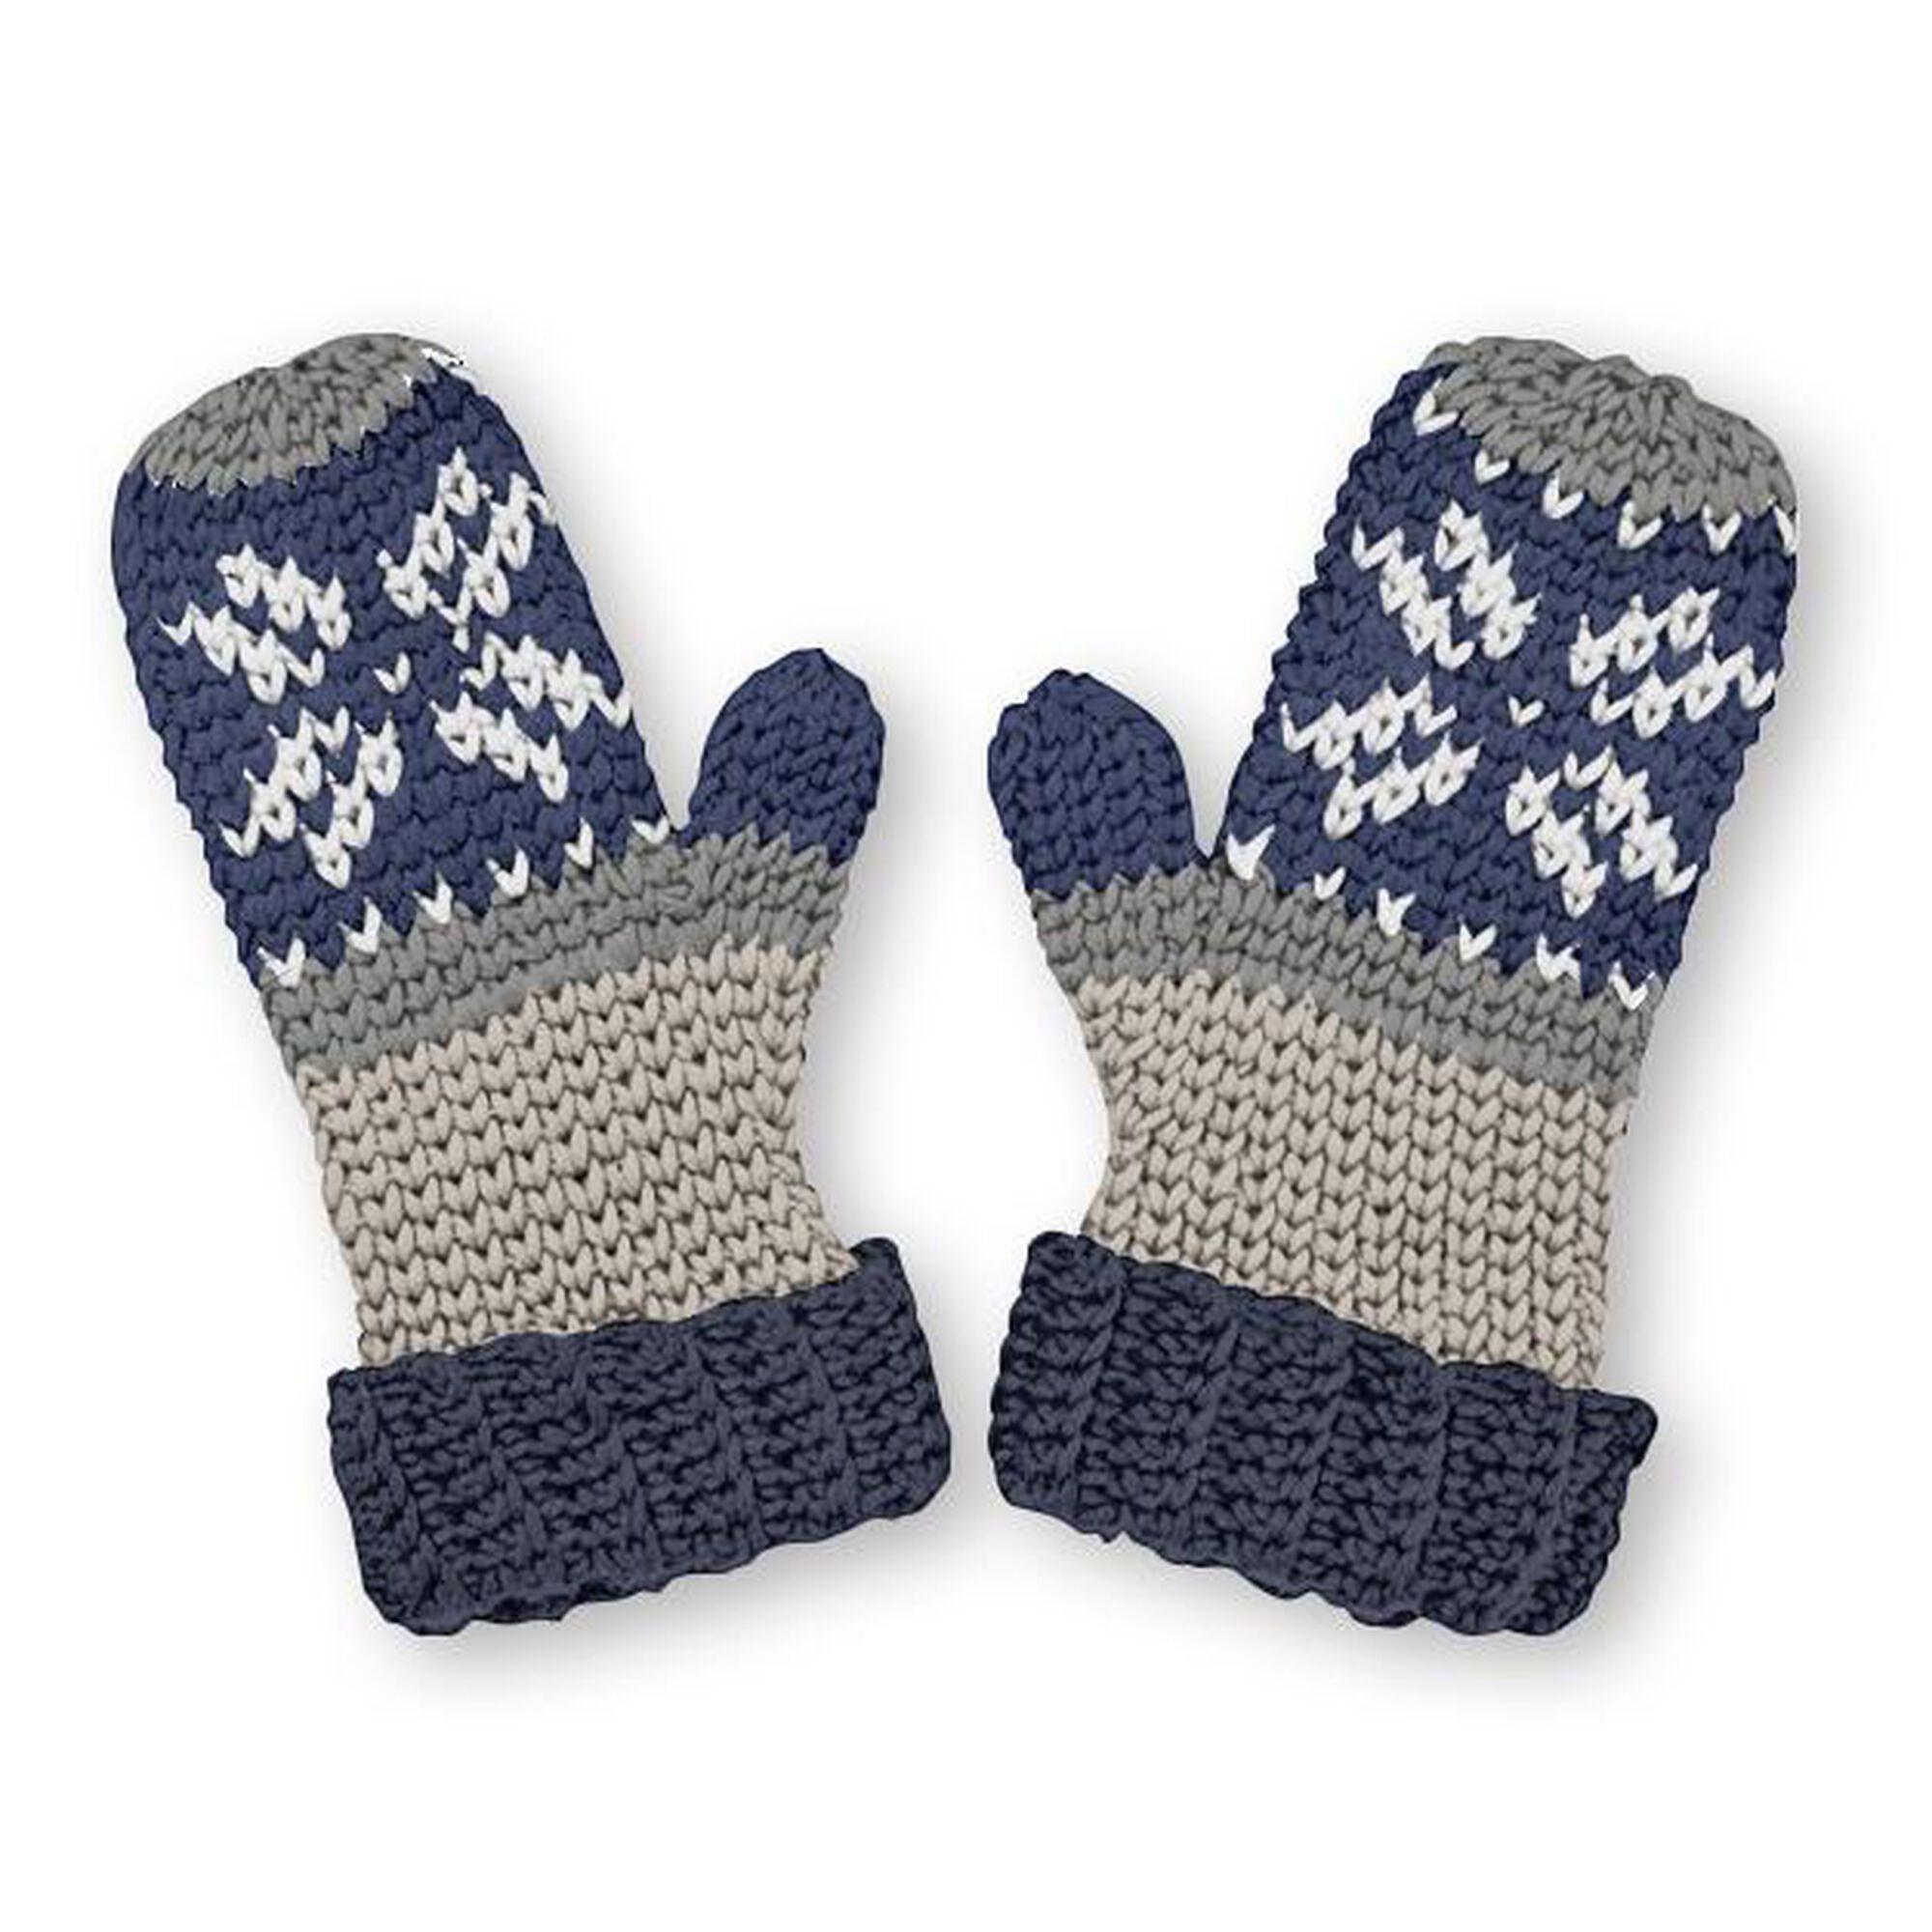 Caron X Pantone Fair Isle Crochet Mittens Pattern Yarnspirations